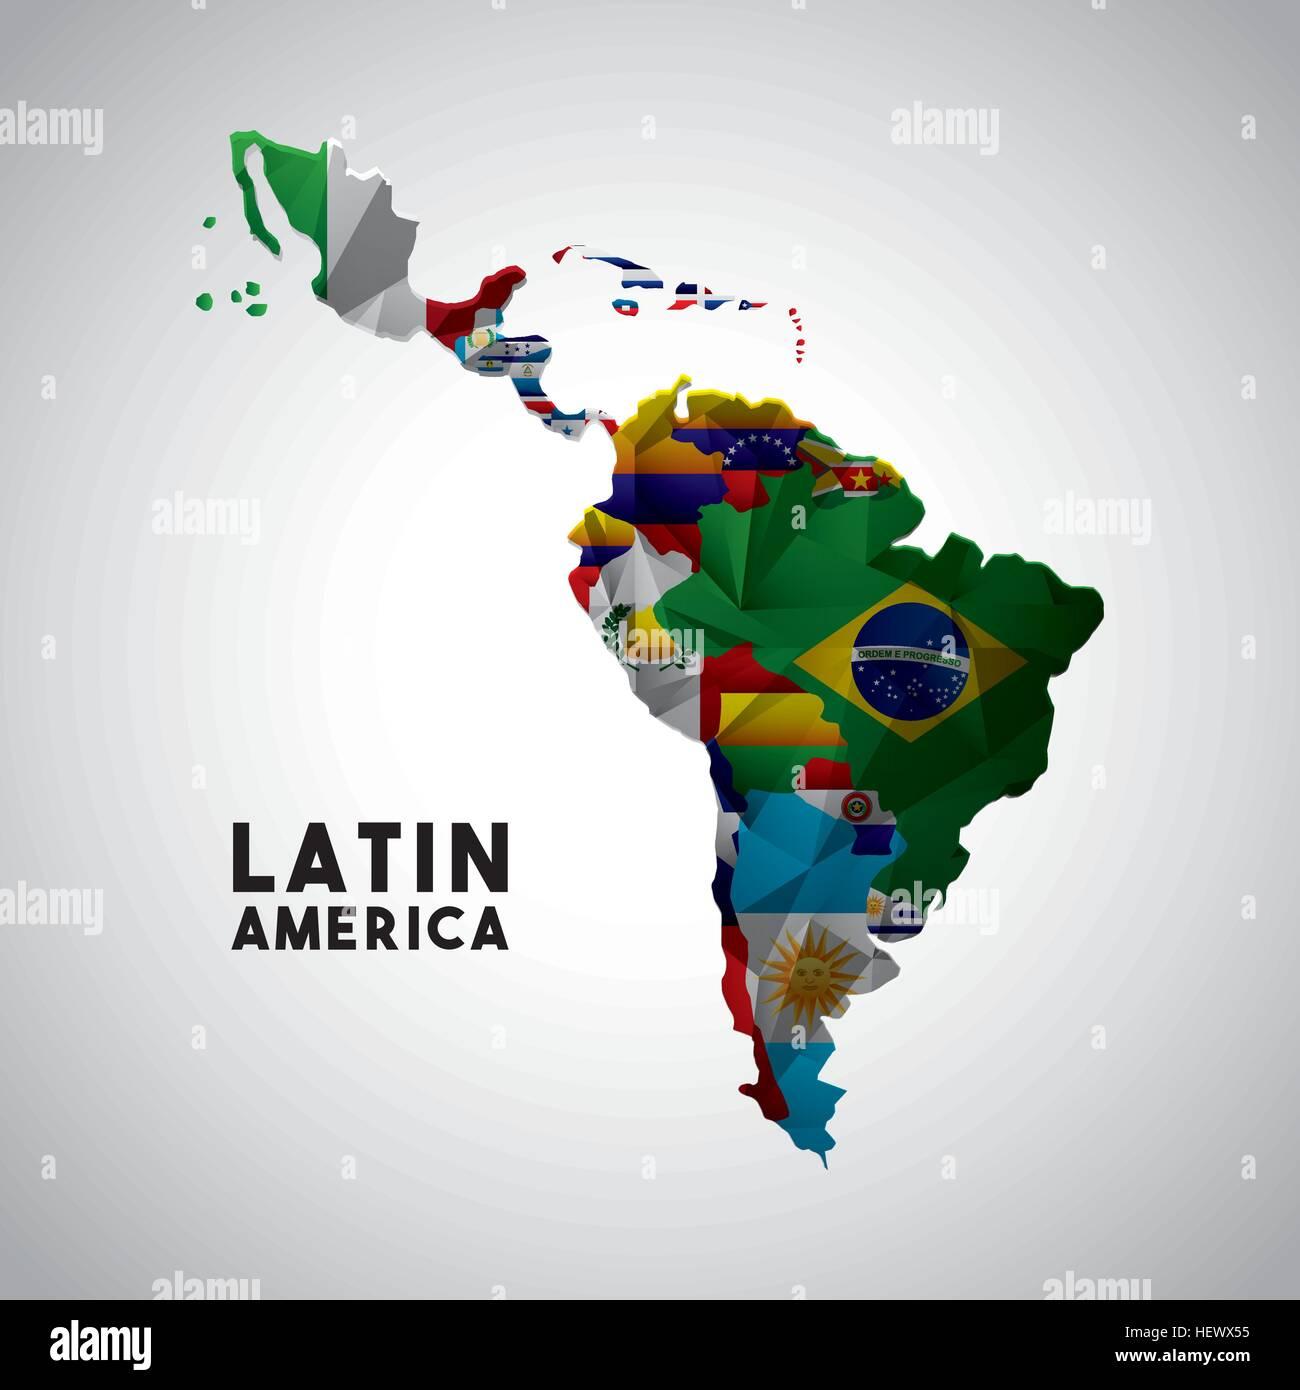 Map Latin America Flags Countries Stock Photos & Map Latin America ...